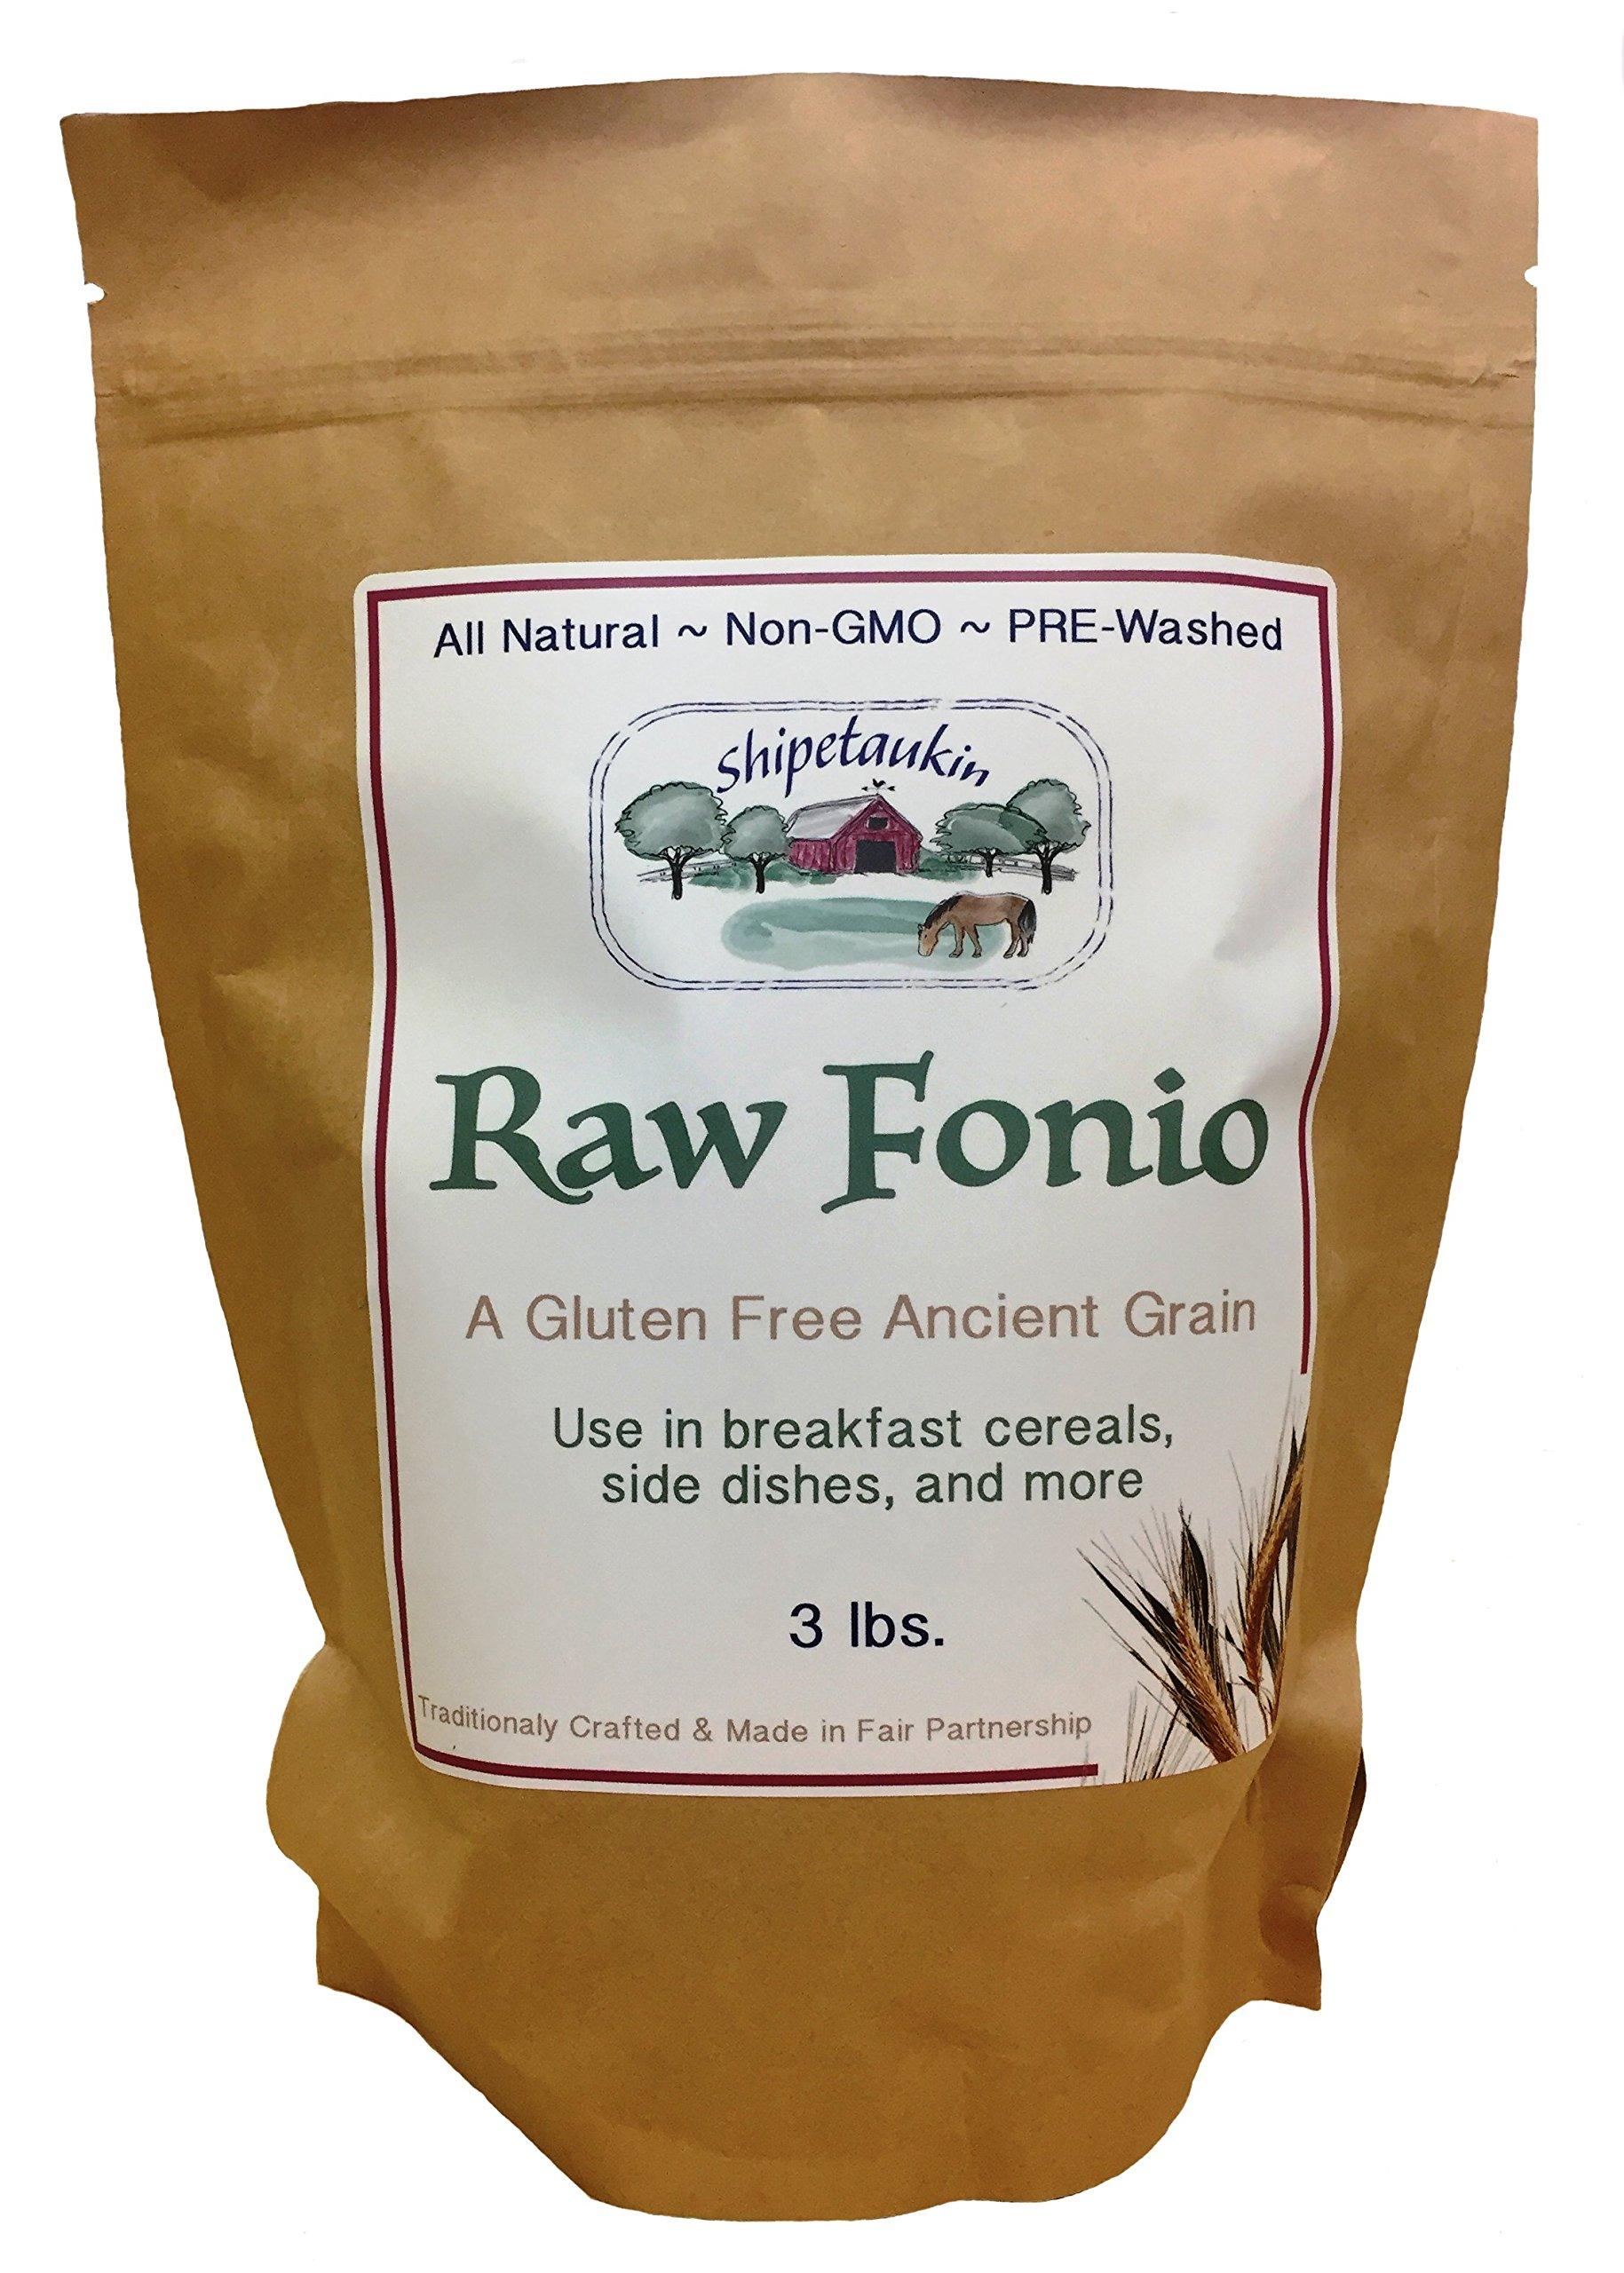 Shipetaukin Raw Fonio Ancient African Grain, 3 Lbs.